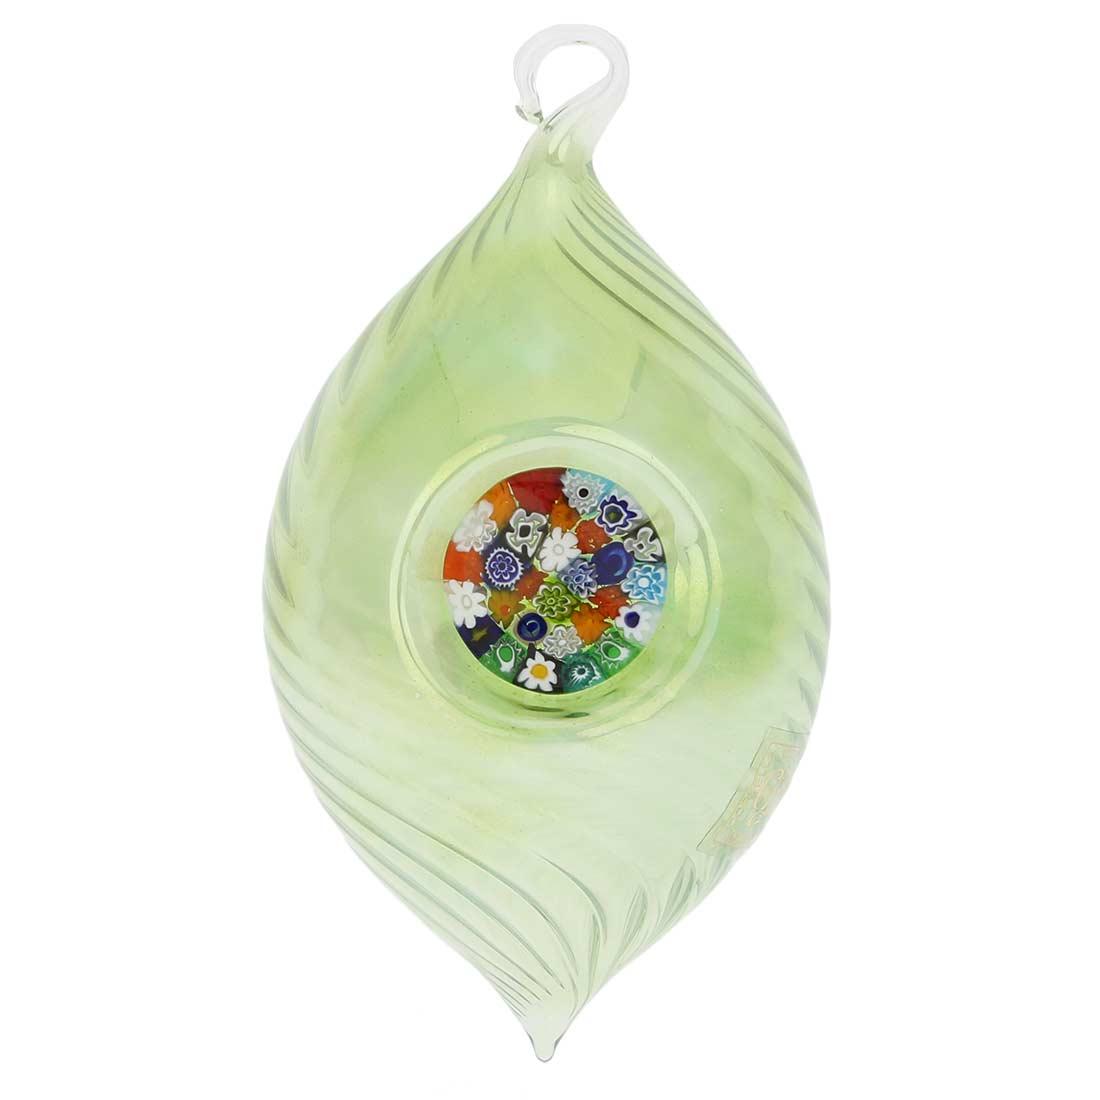 Christmas tree ornaments murano glass and murano glass - Murano glass ornaments italy ...